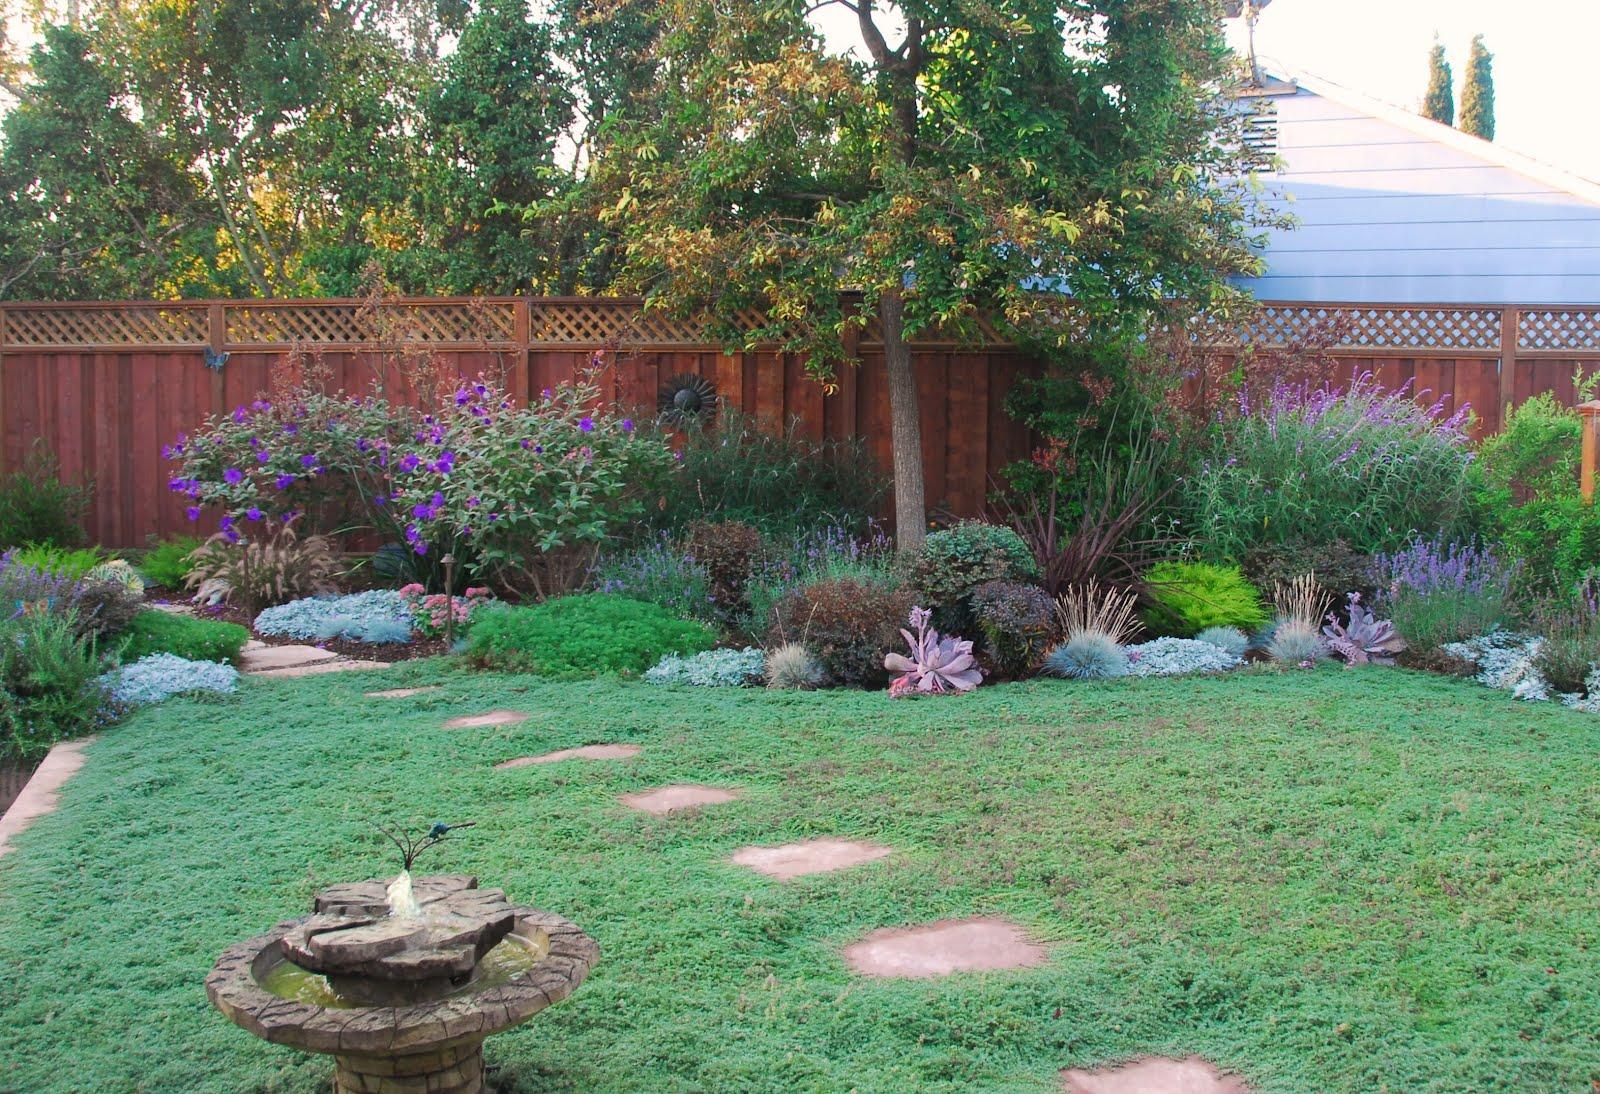 astrid gaiser garden design lilac lawns or why water wise rocks. Black Bedroom Furniture Sets. Home Design Ideas